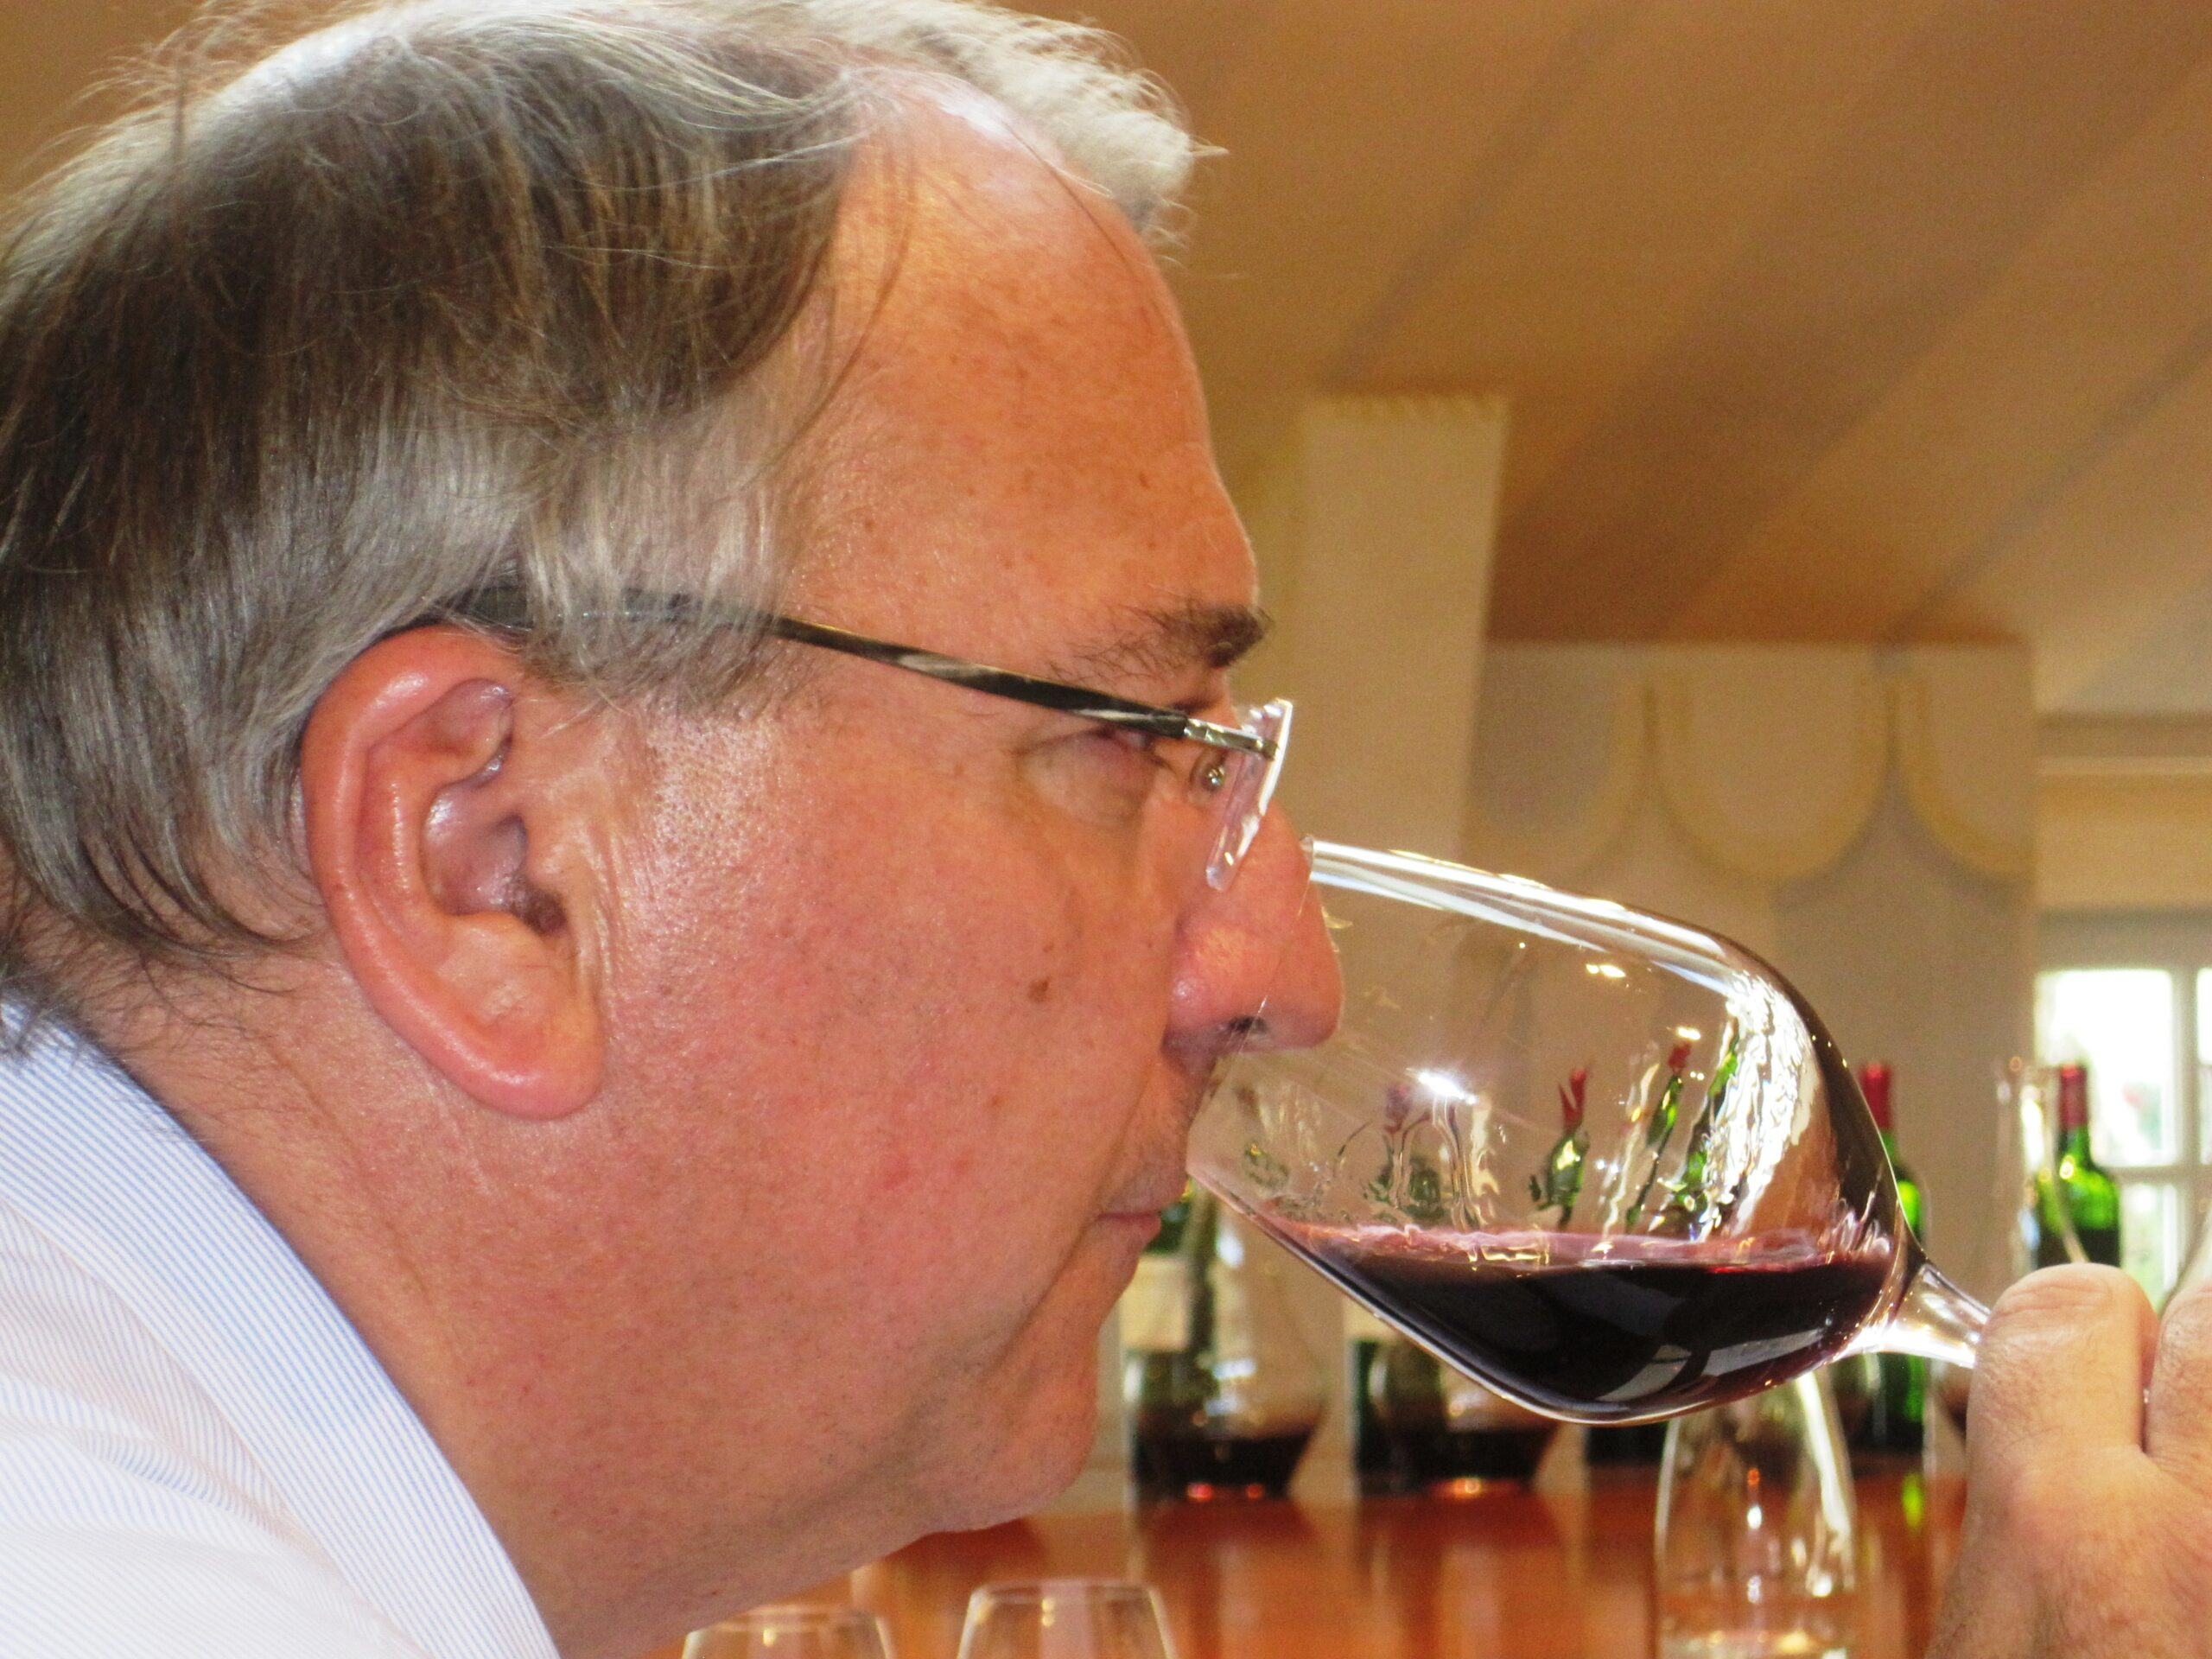 Branaire Ducru Bordeaux Wine 4th Growth Deserves Upgrade in St. Julien